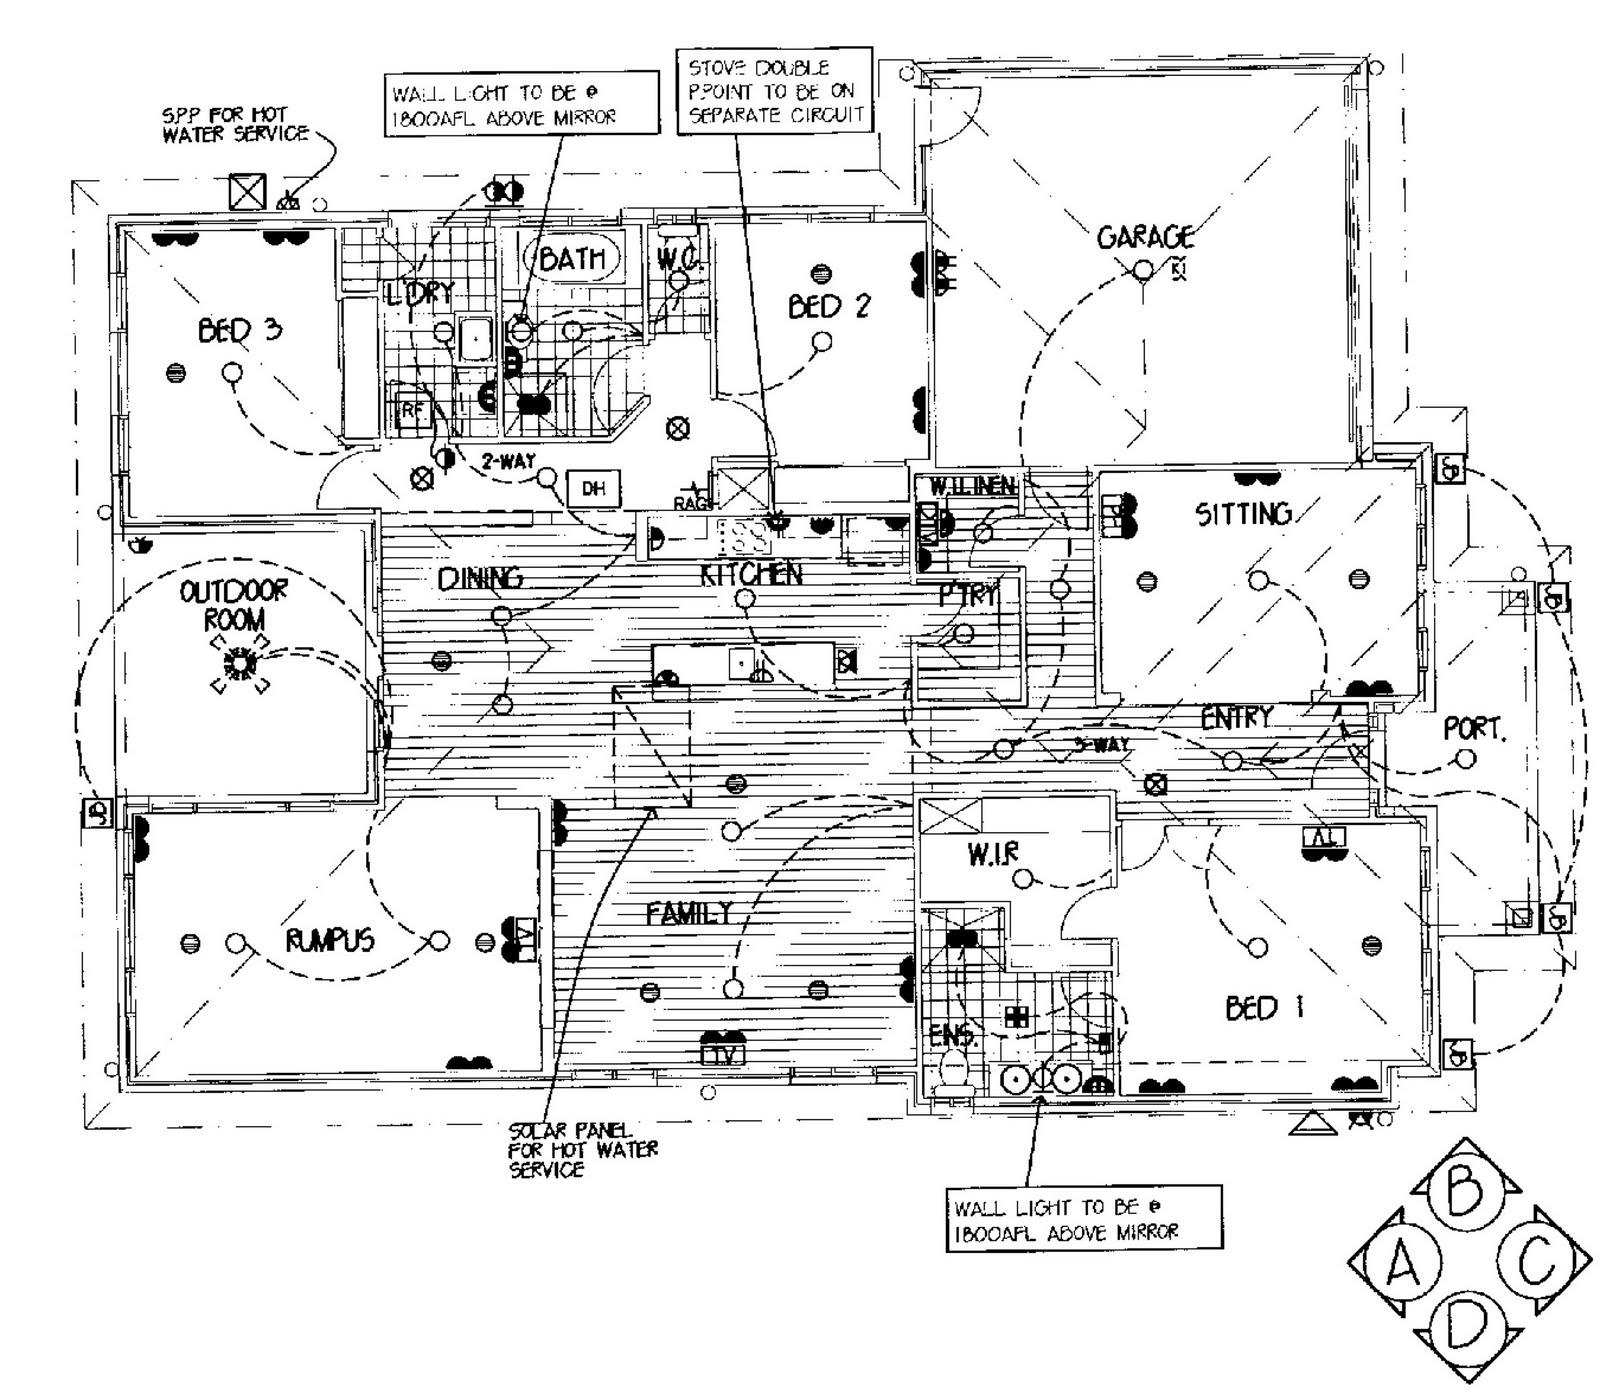 Ky 39 S Big Adventure House Plans